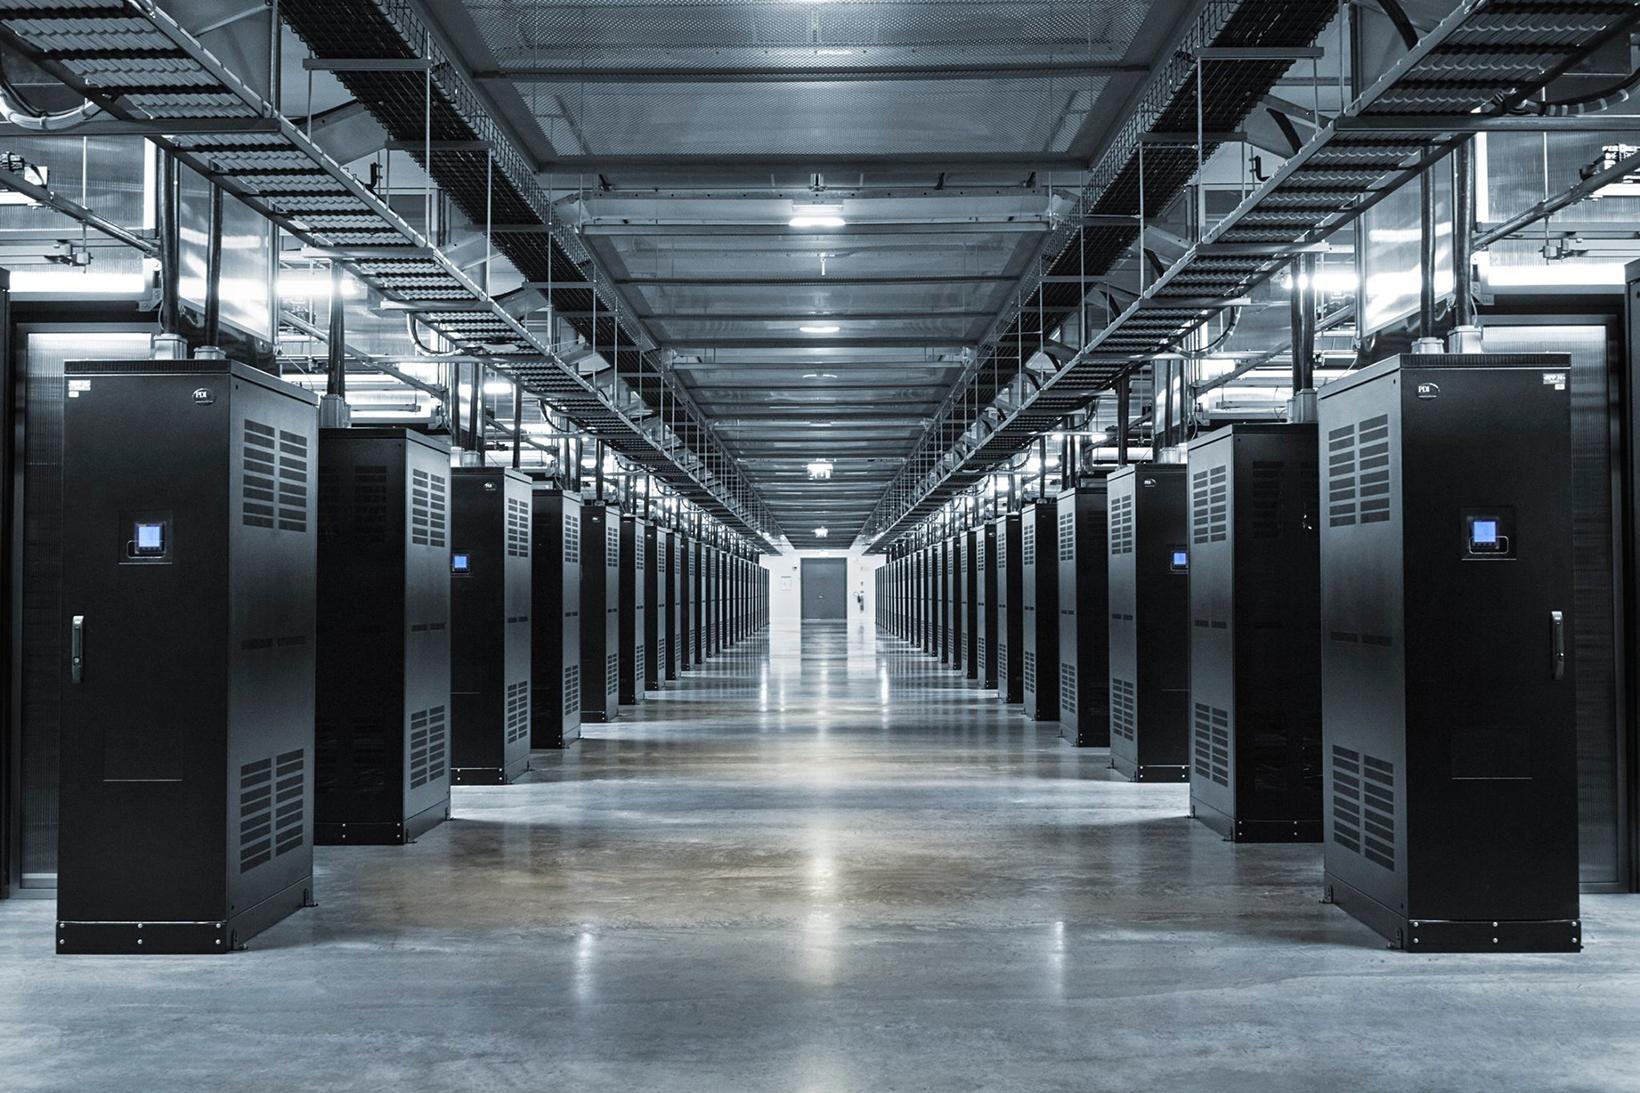 Mark Zuckerberg Facebook Data Center Lulea Sweden